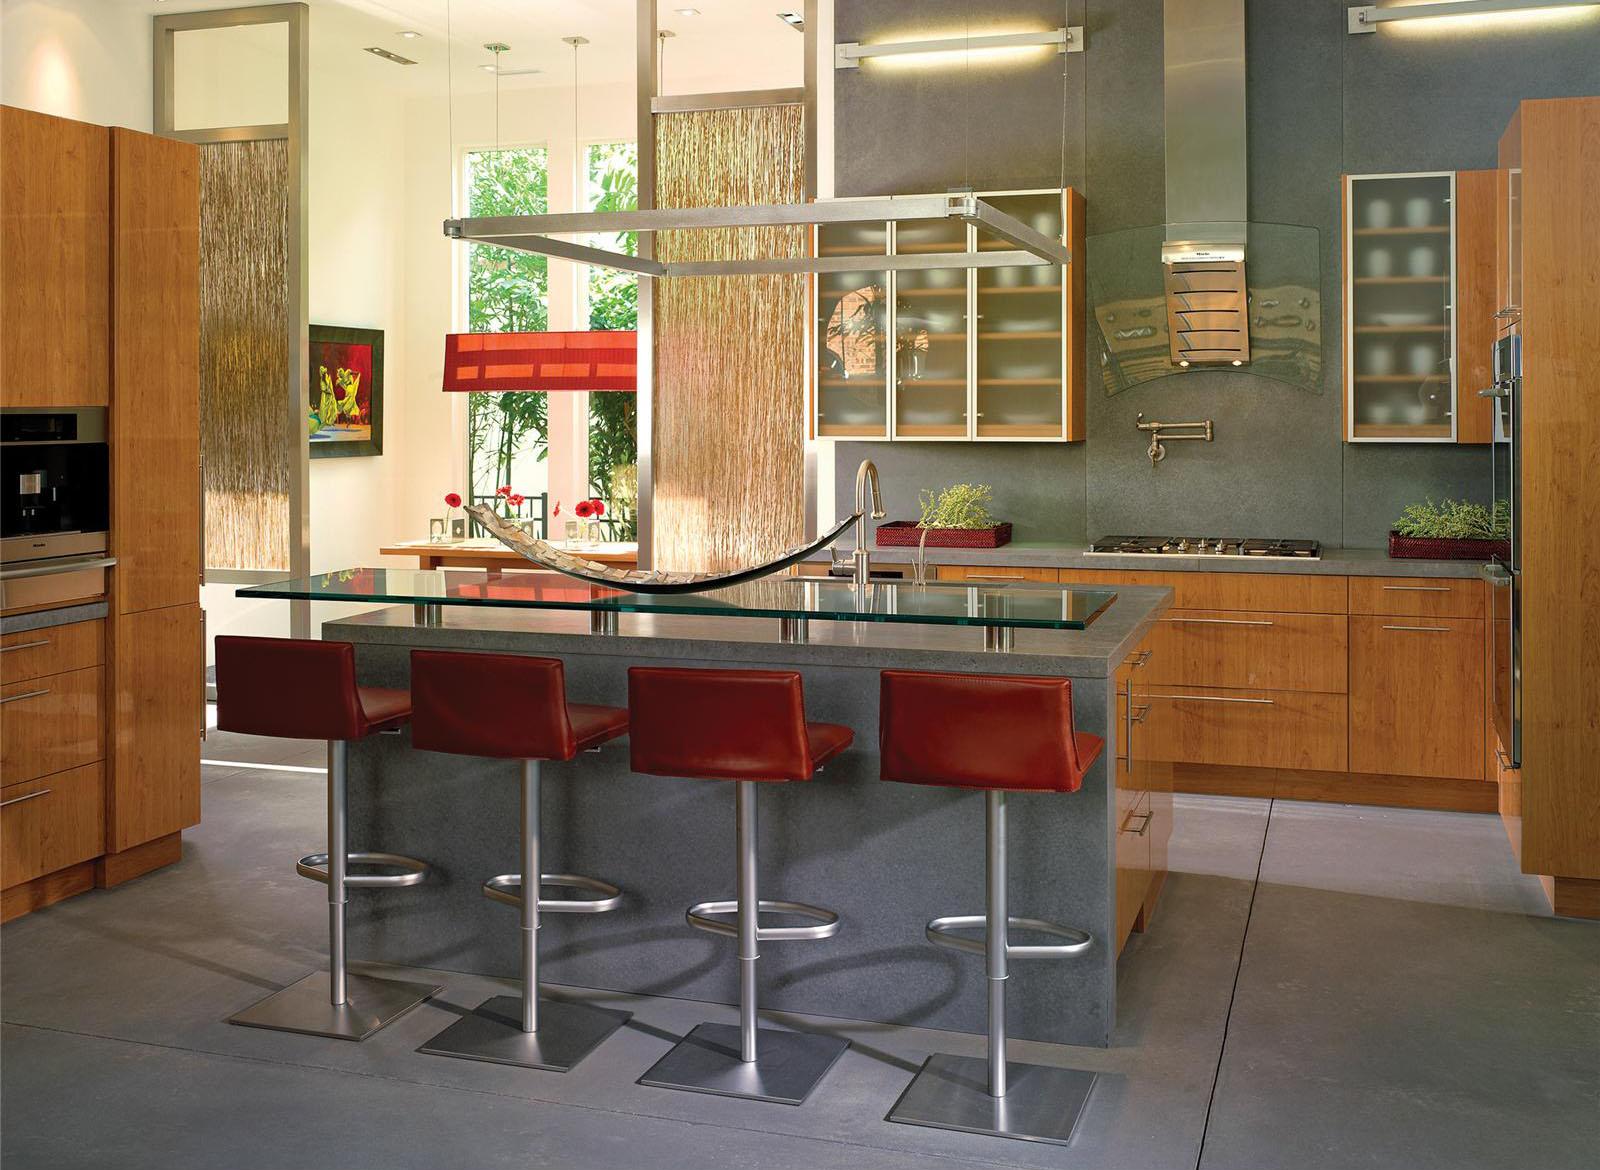 Kitchen countertop storage Photo - 8